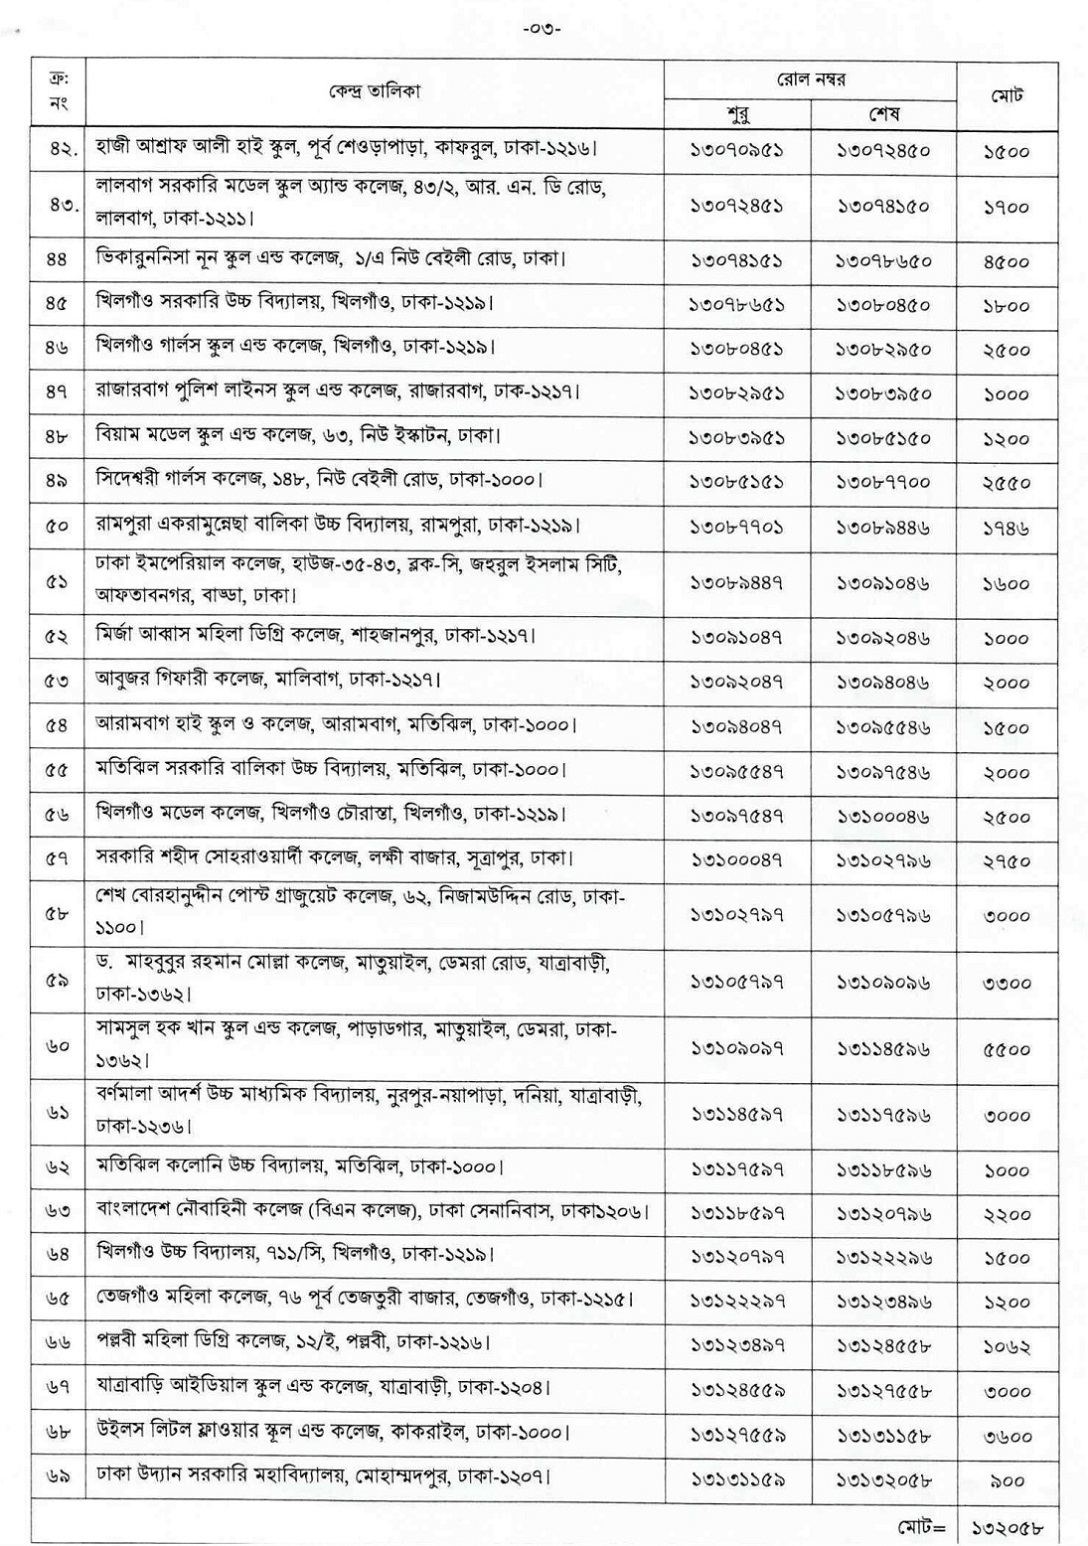 Bangladesh Bureau of Statistics bbs VIVA Exam Notice 2019